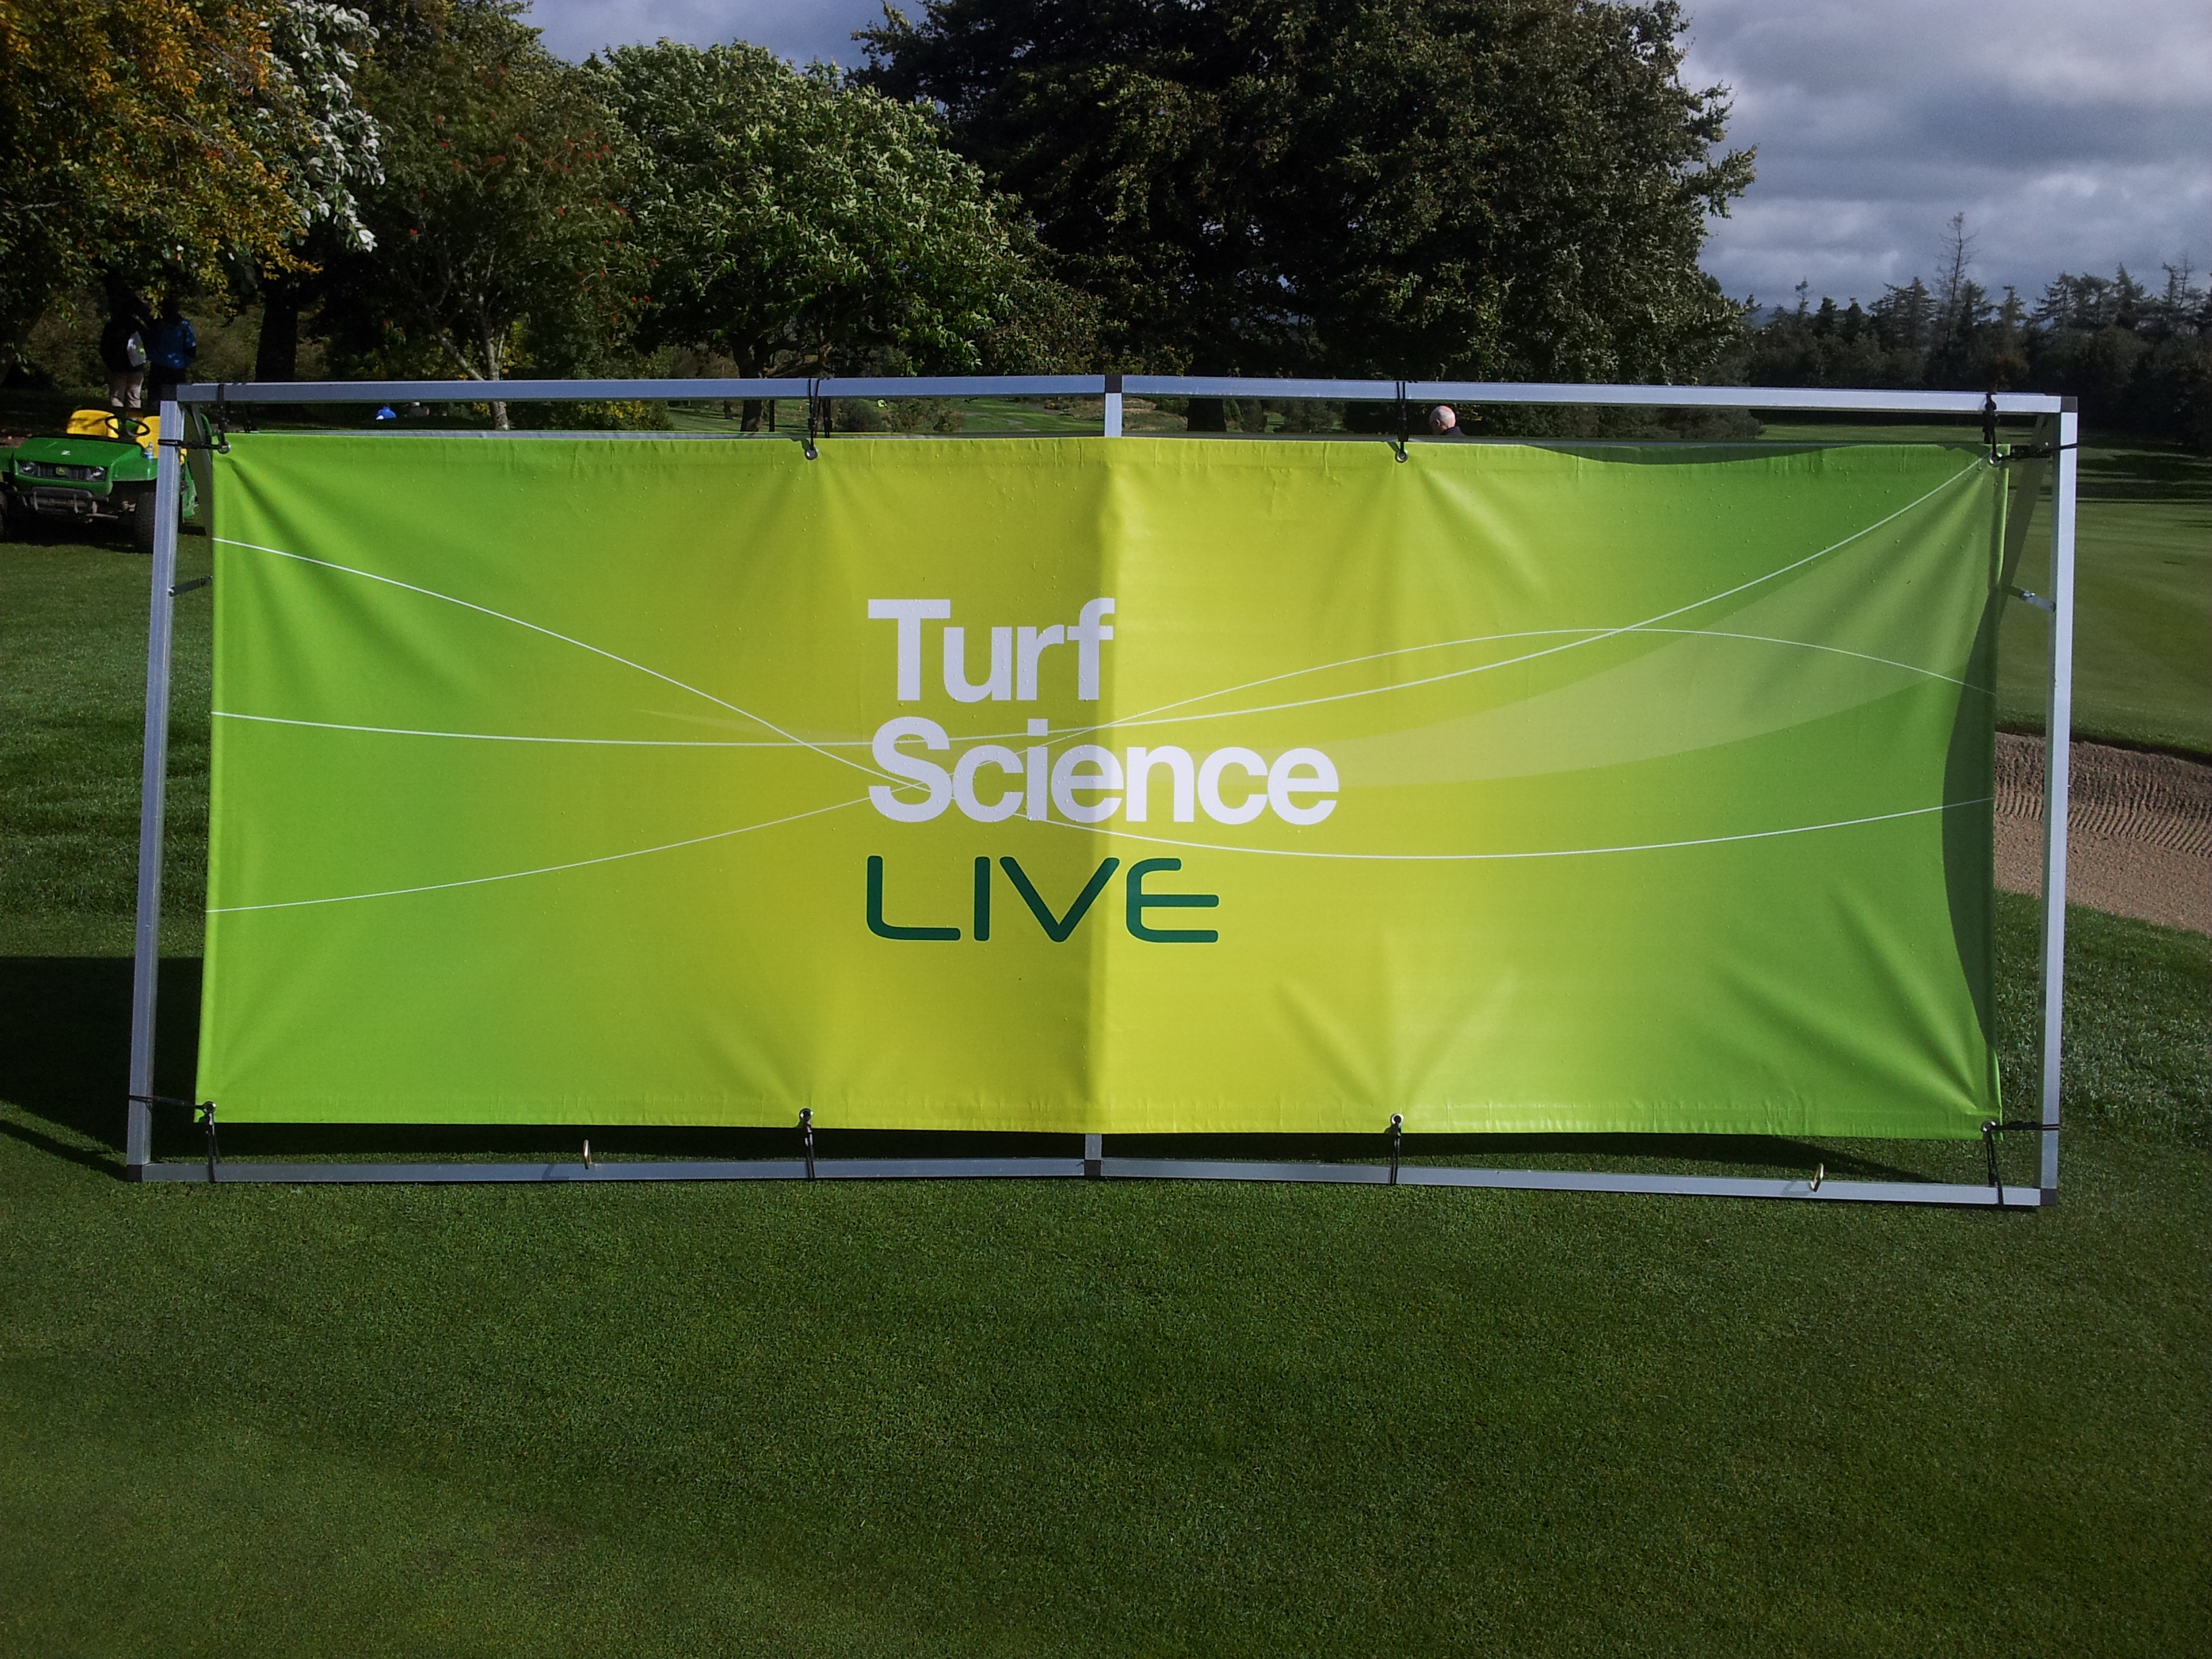 Turf Science Live